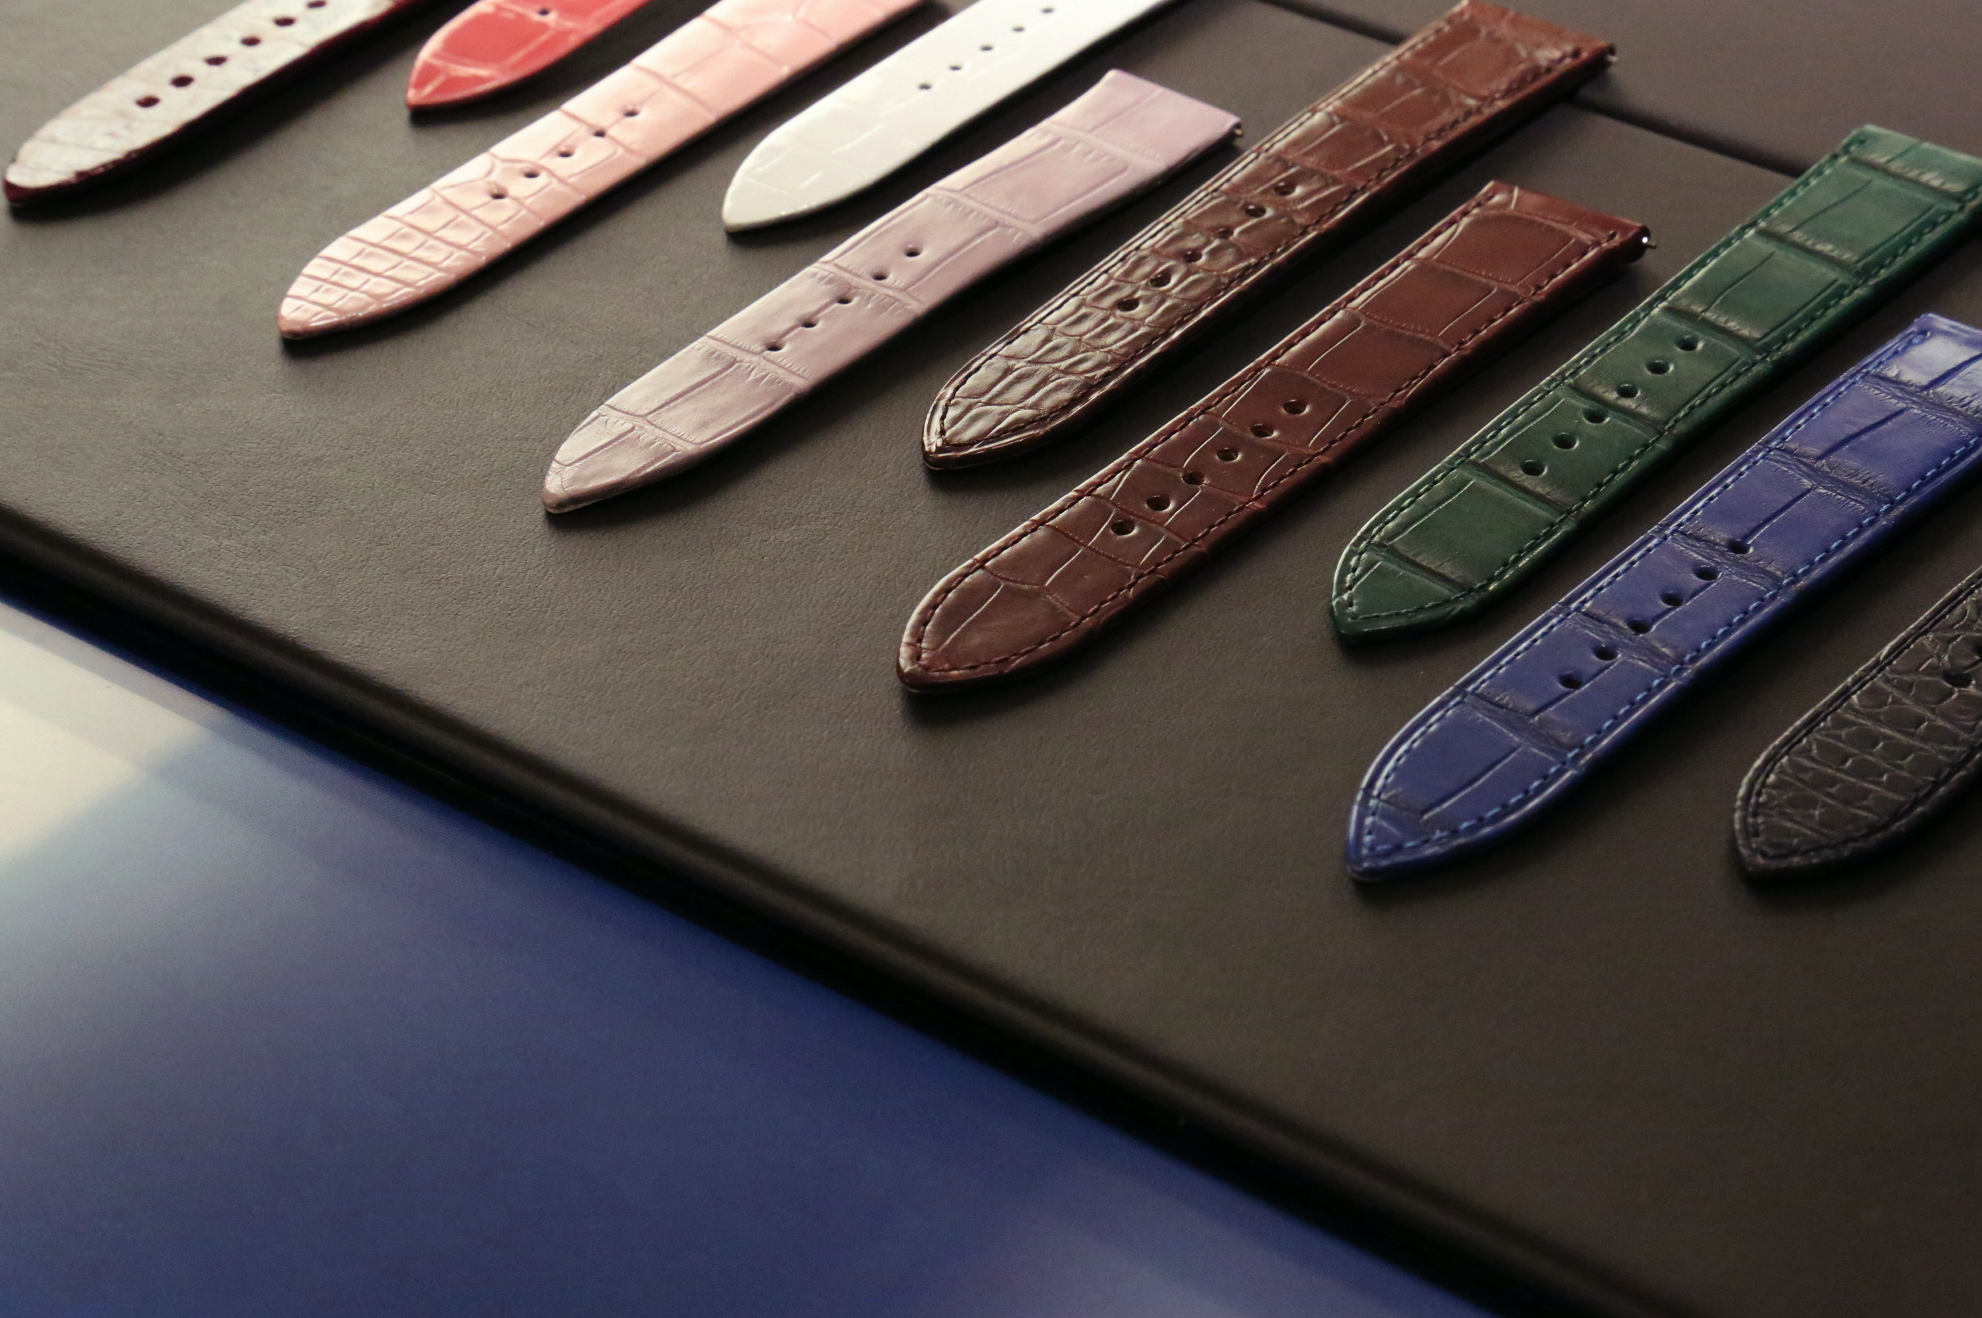 Atelier Reverso, Jaeger-LeCoultre Flagship  Boutique in London